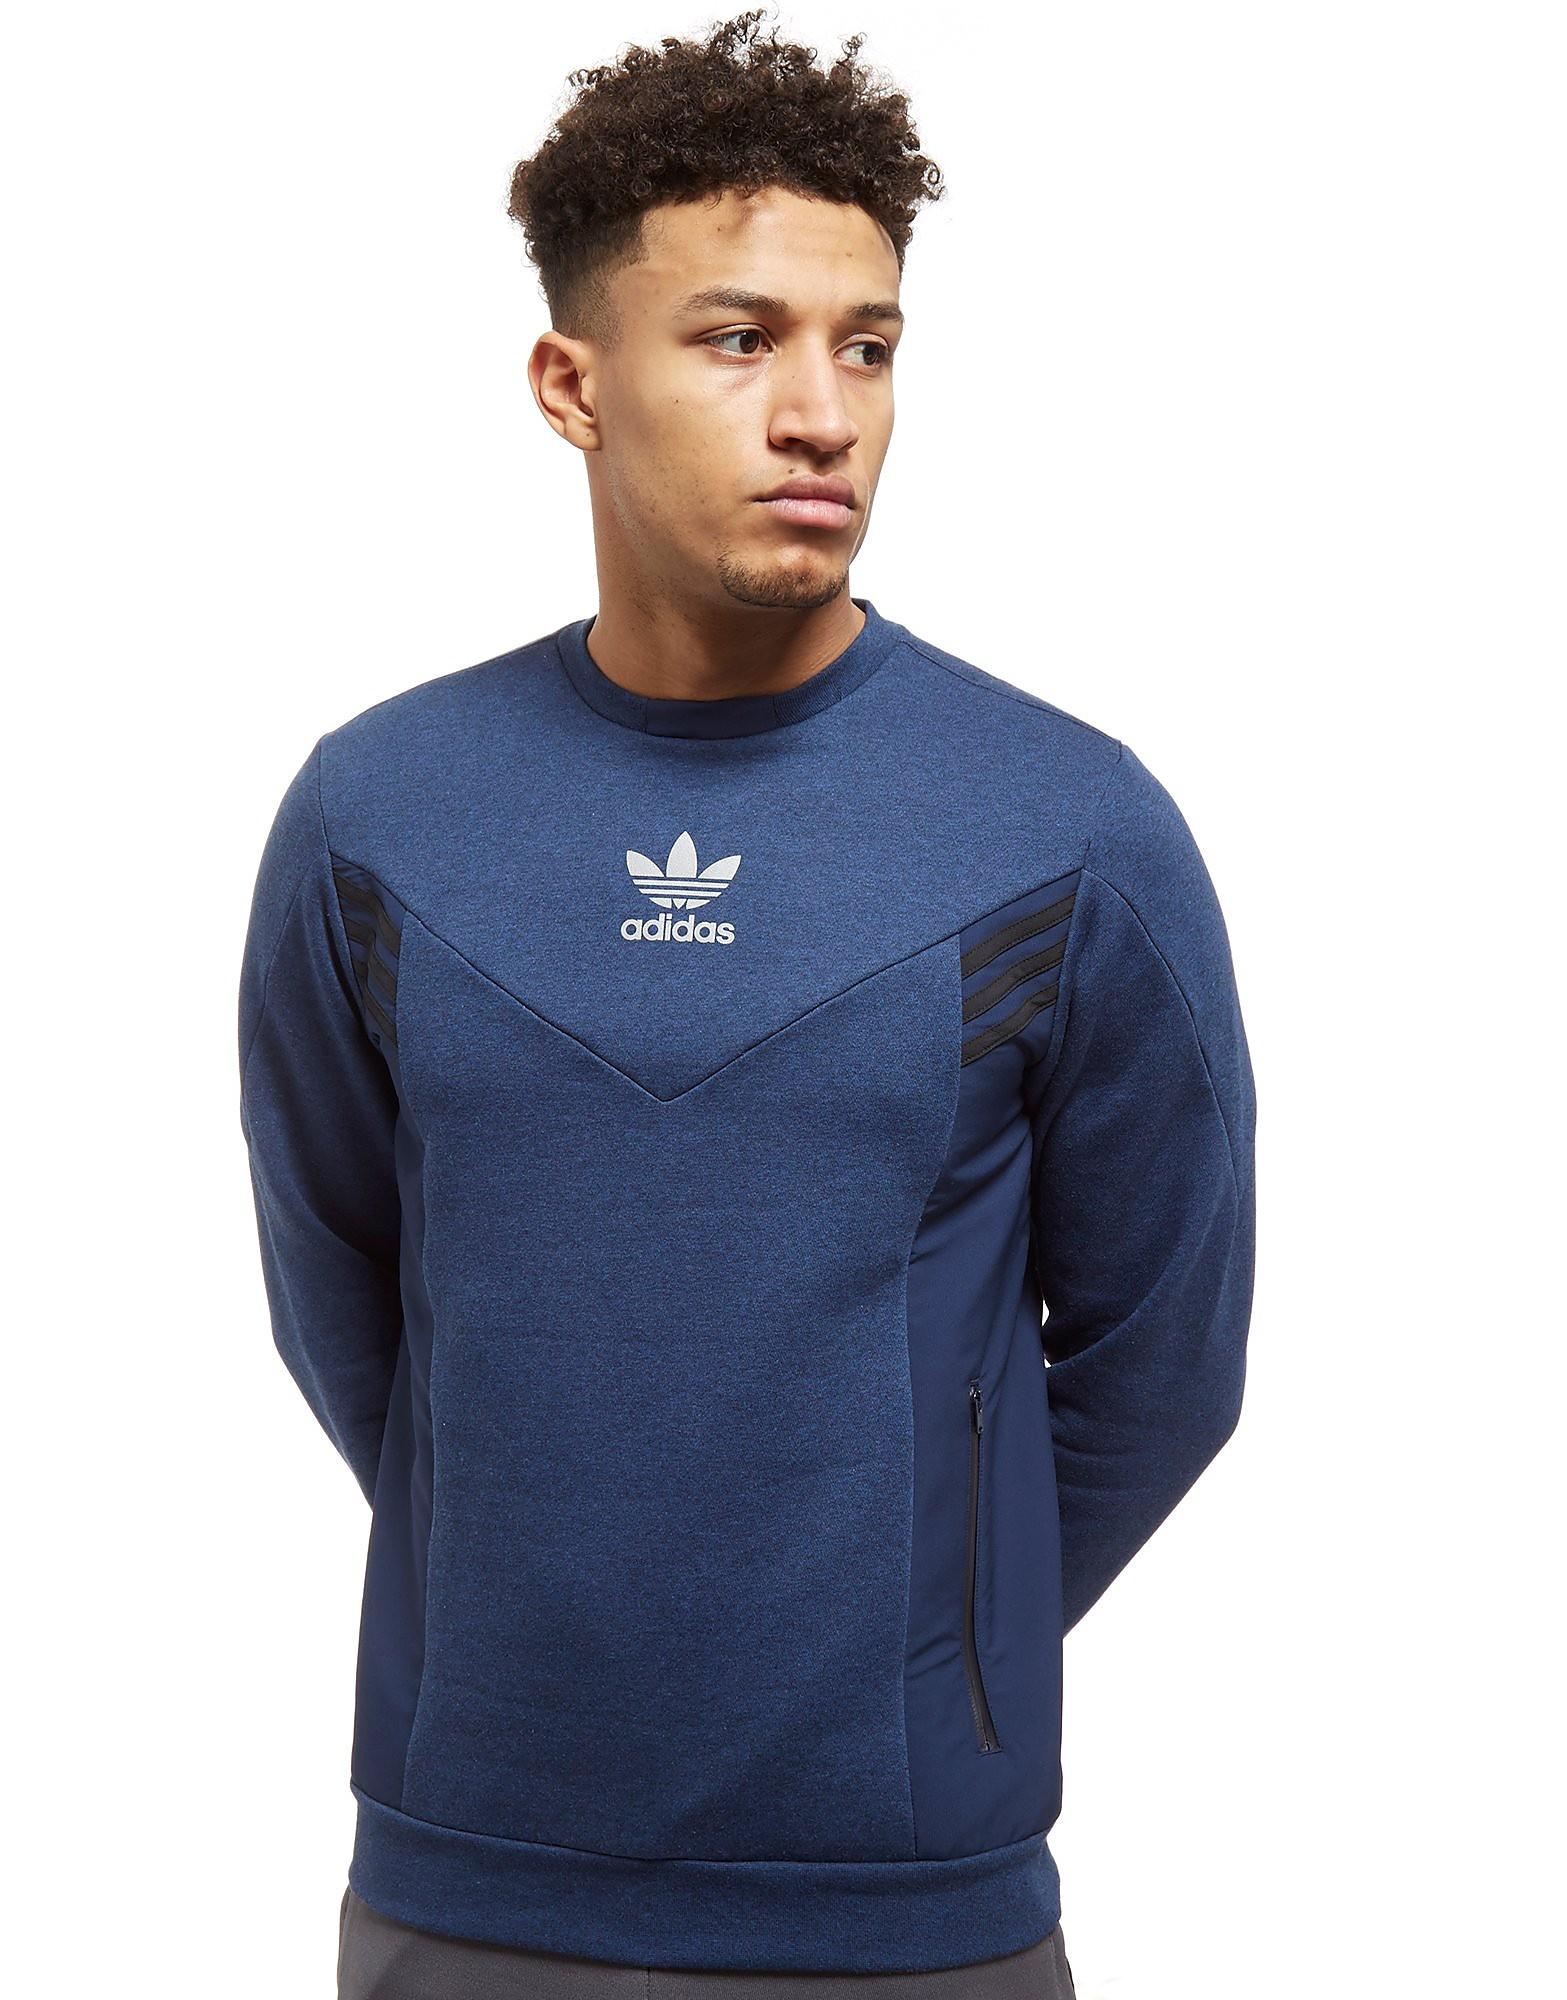 adidas Originals Street Run Crew Sweatshirt